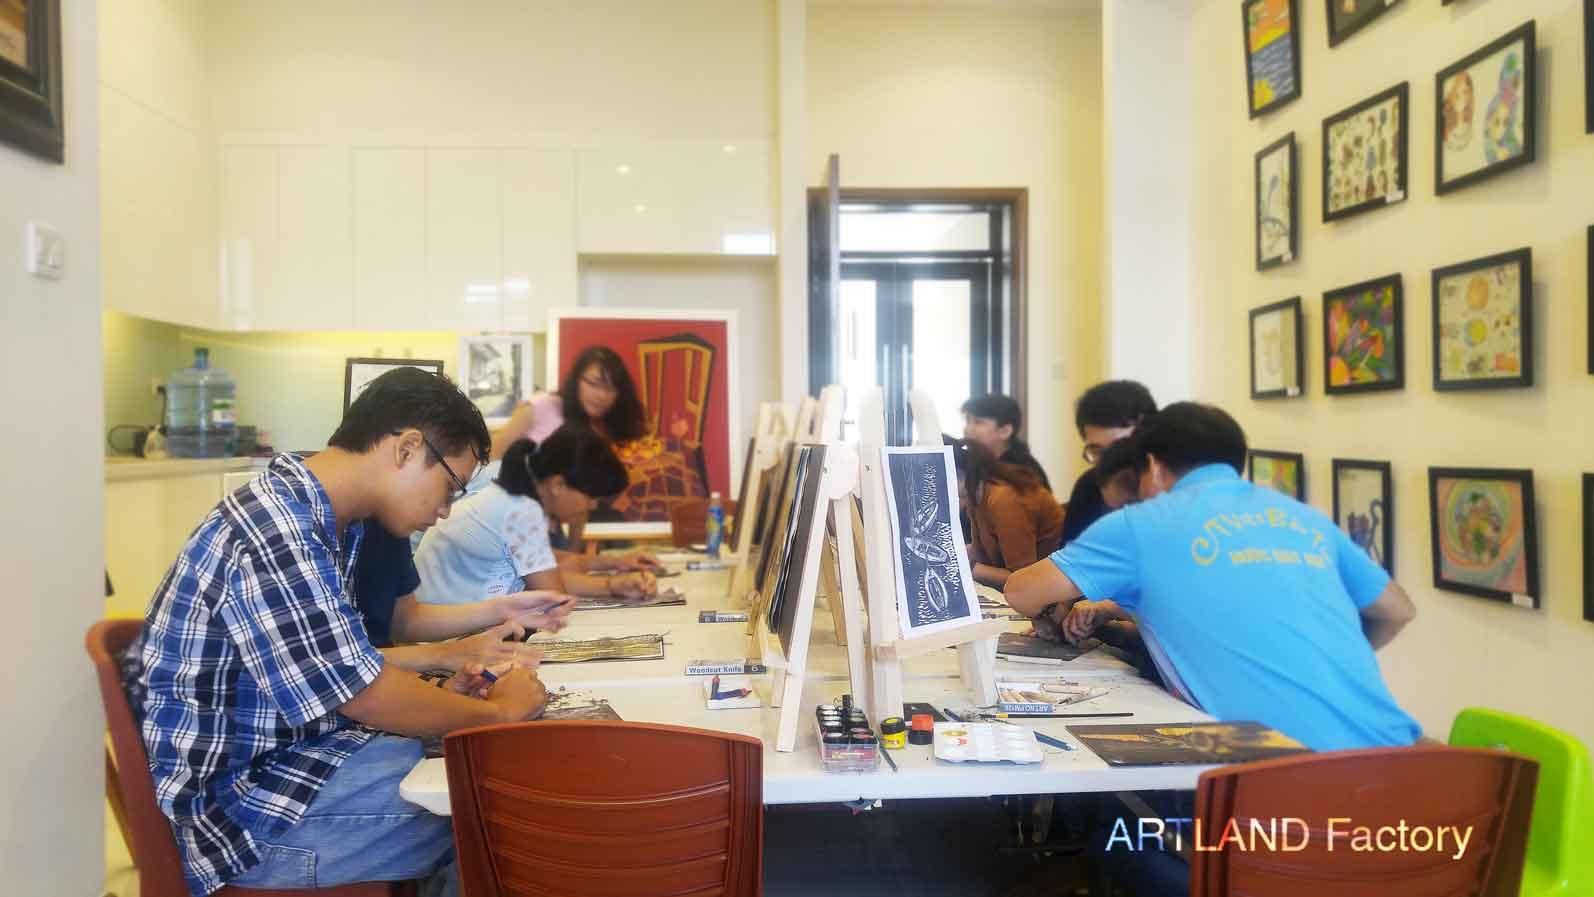 Workshop-tranh-khac-go  LỚP HỌC VẼ CHO NGƯỜI ĐI LÀM Workshop tranh khac go